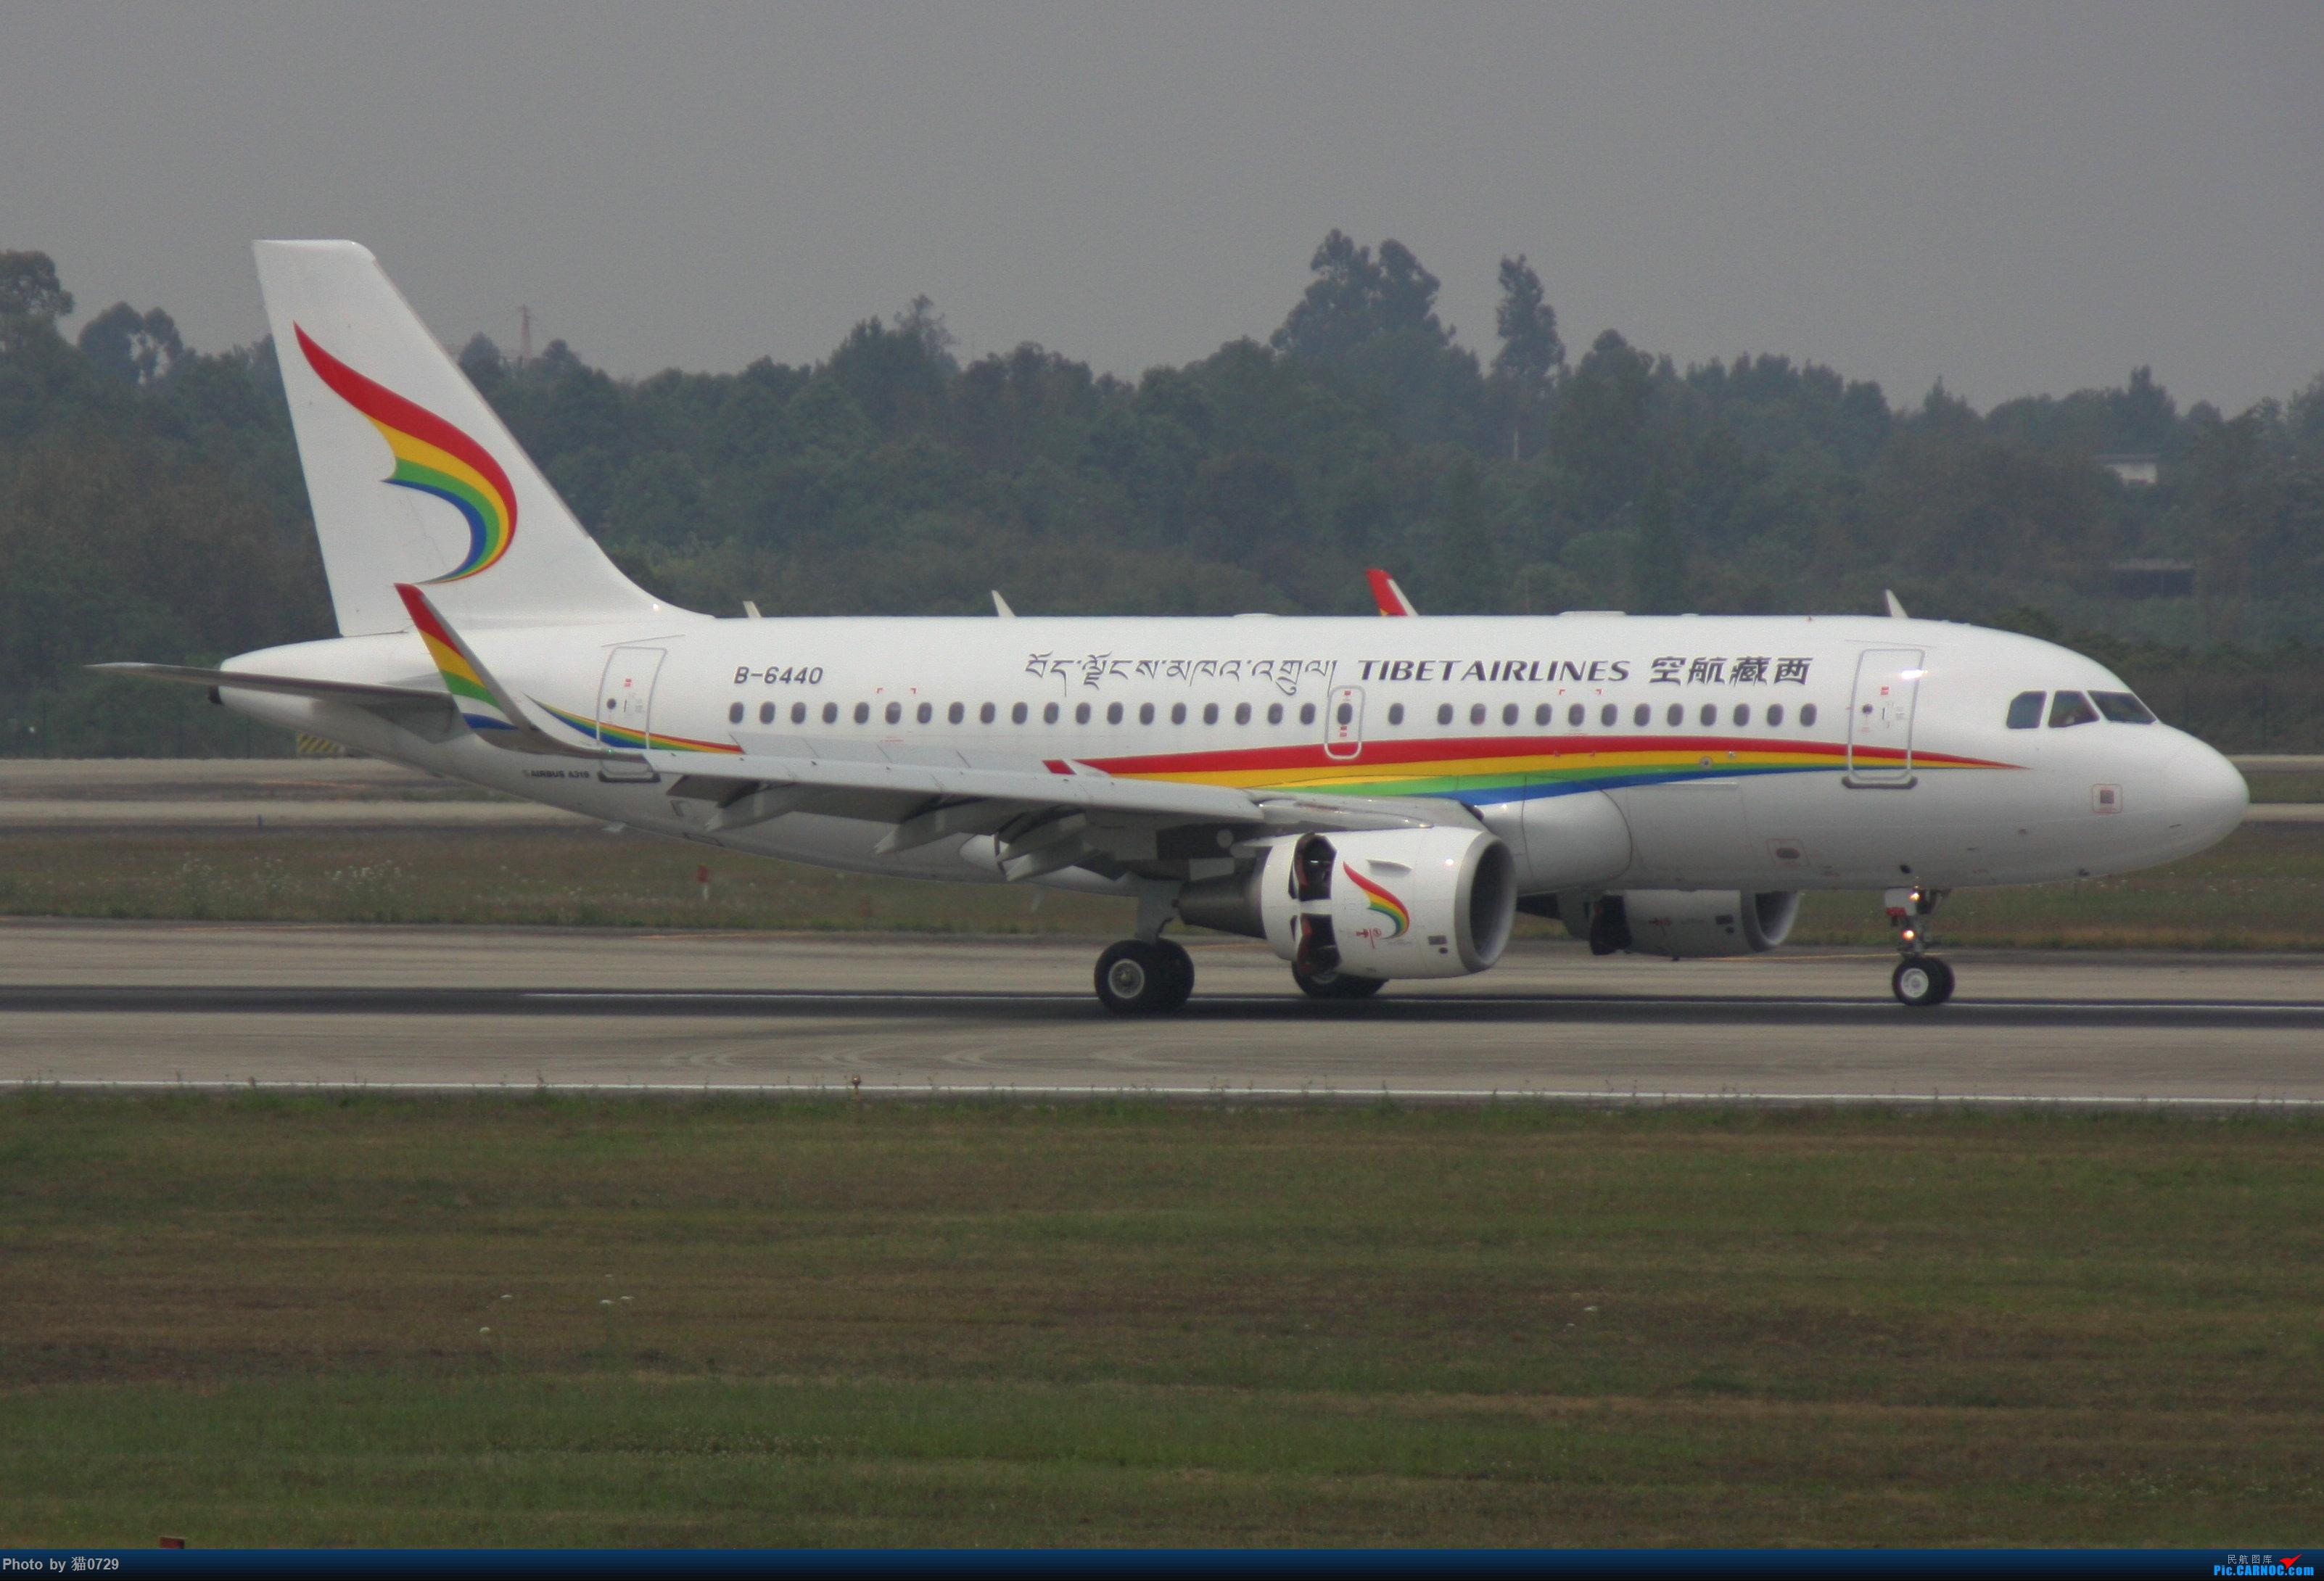 Re:[原创]CTU 119.425 水泥 伊朗346 巴基斯坦777 AIRBUS A319-100 B-6440 中国成都双流国际机场